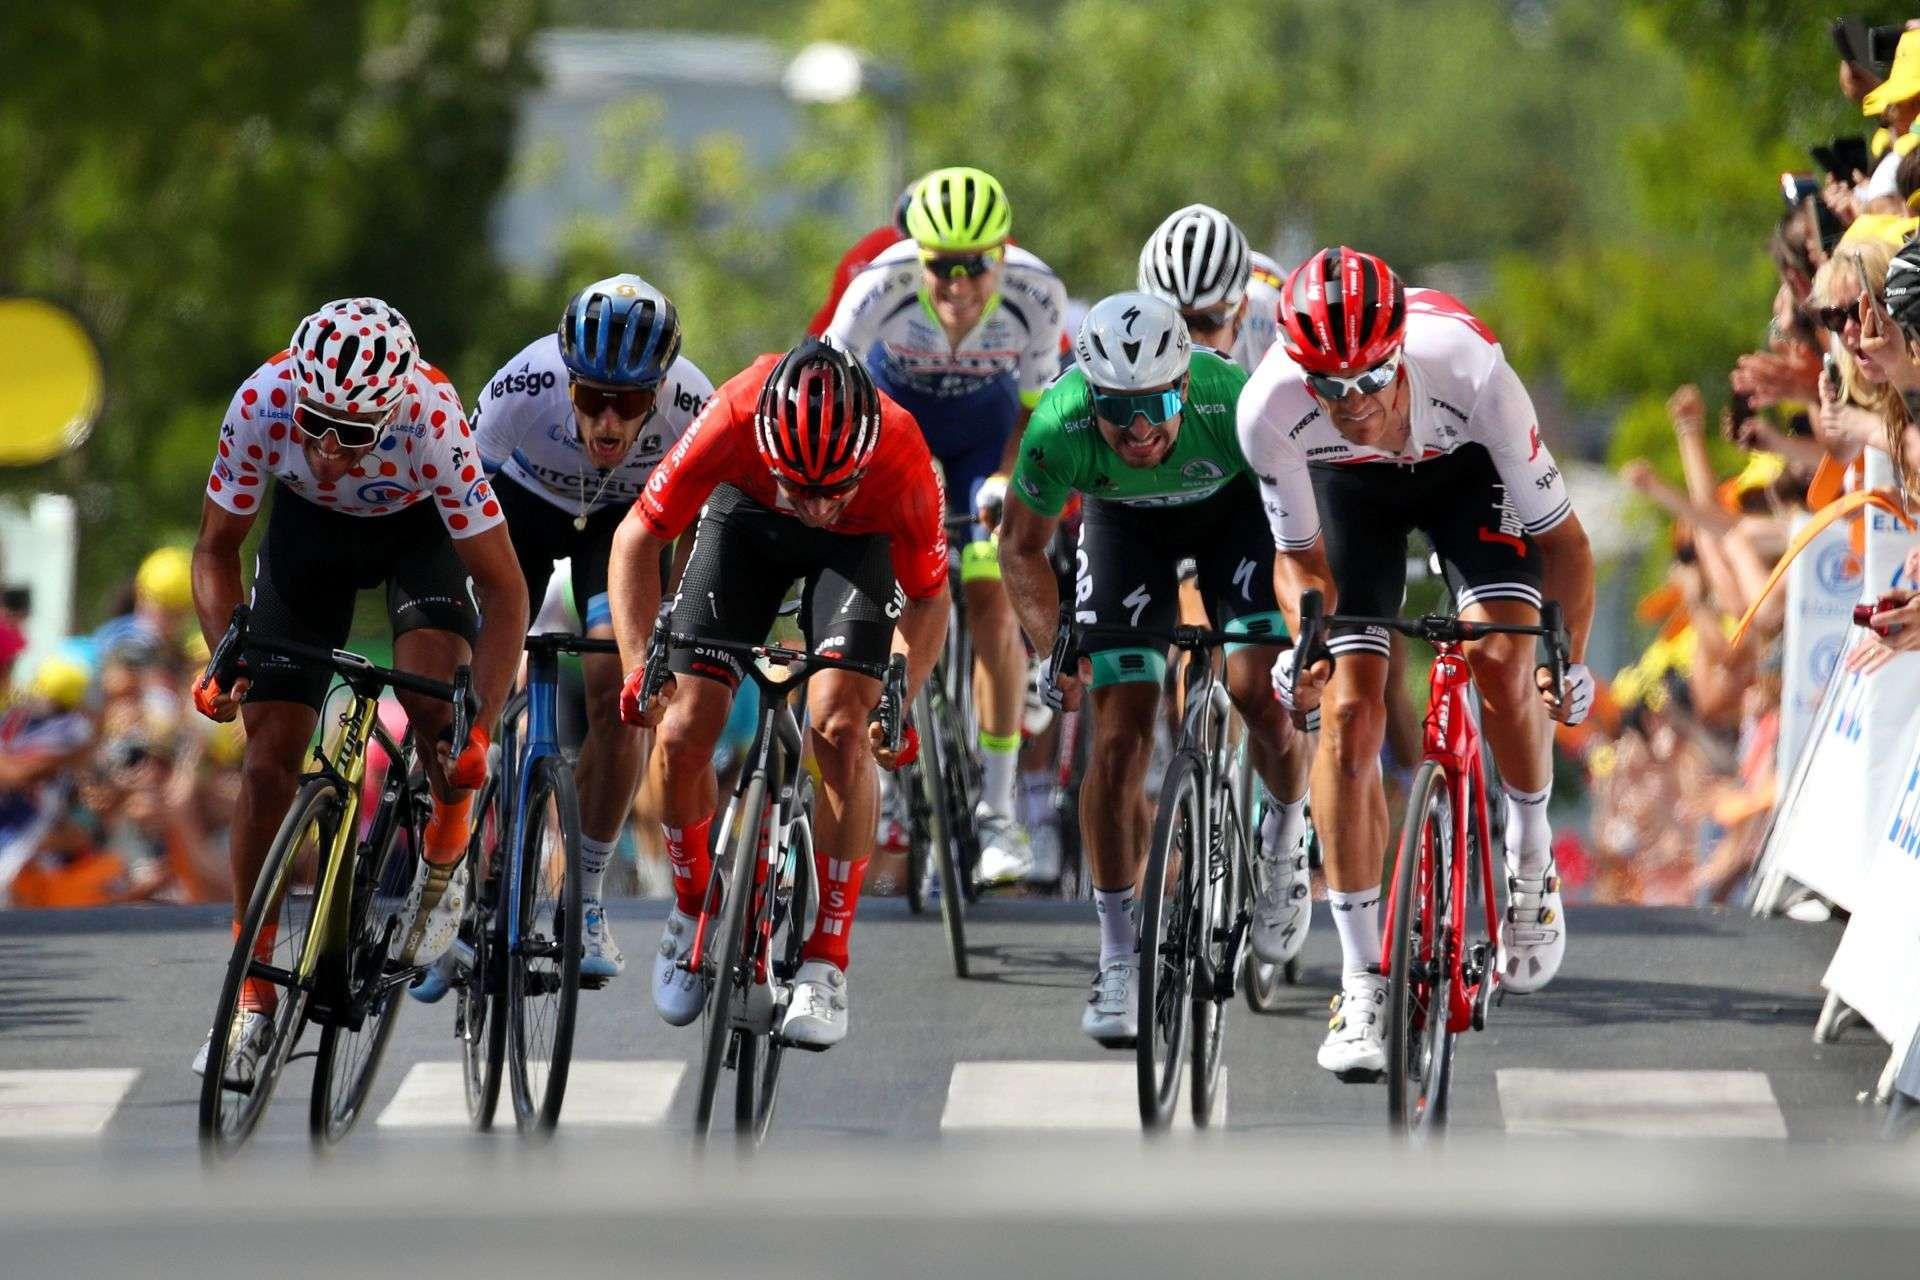 Elisa Longo Borghini and Jasper Stuyven have both stepped atop the podium this week.